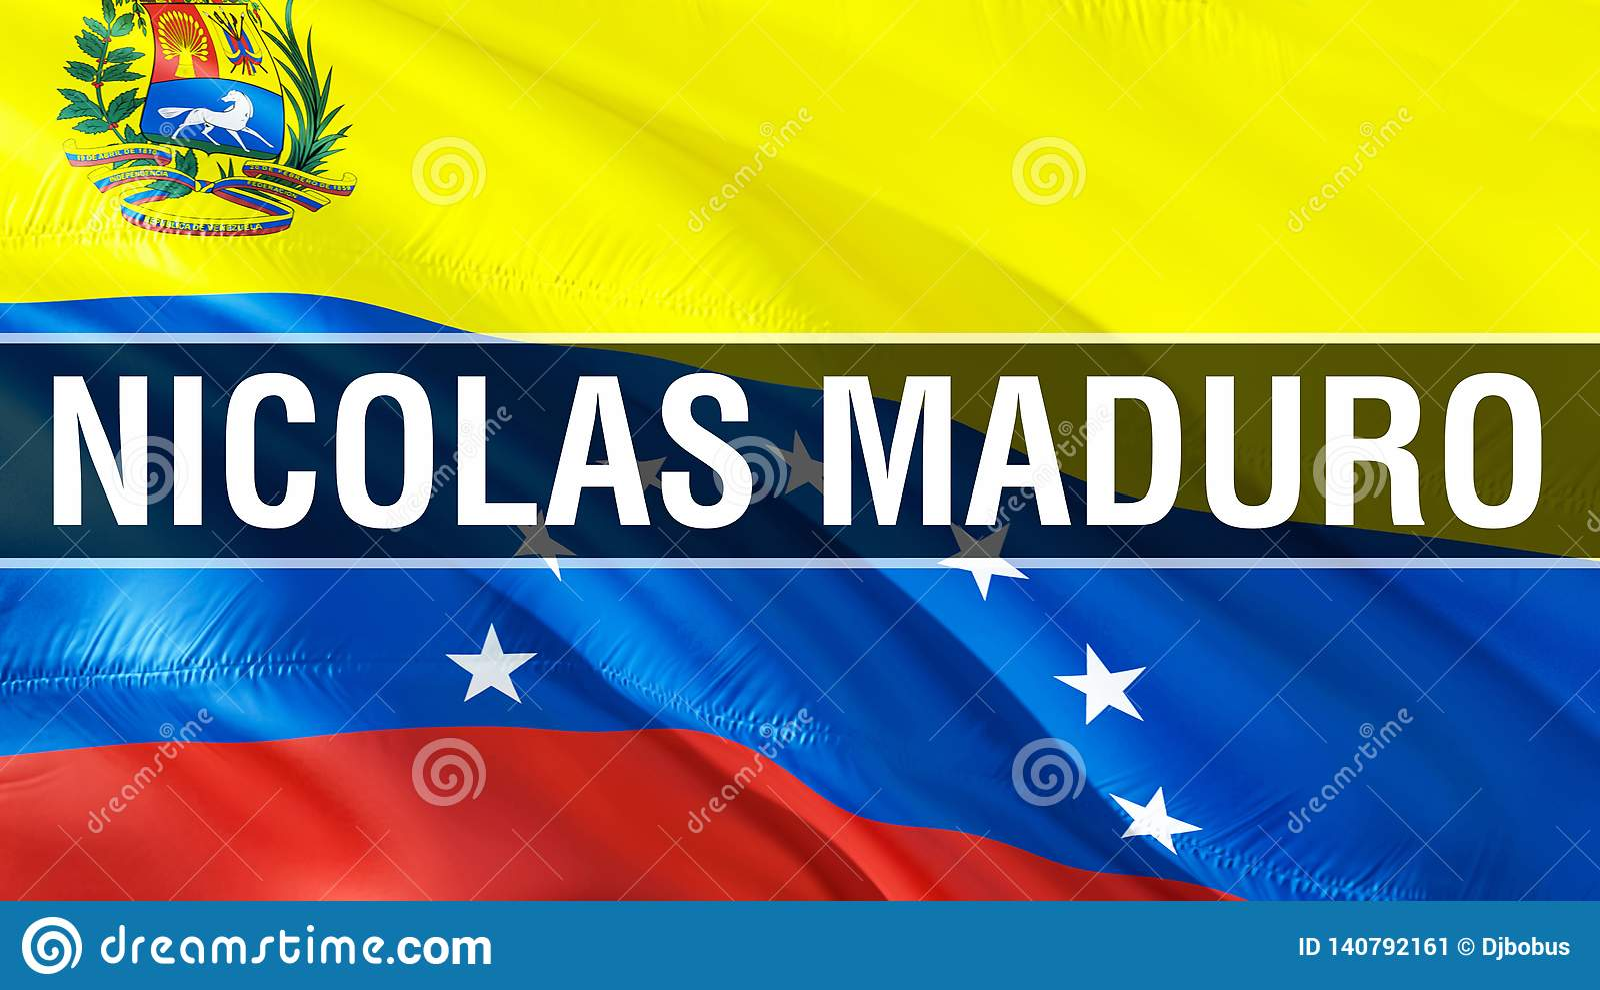 Nicolas Maduro on Venezuela flag. 3D Waving flag design. The national symbol of Venezuela, 3D rendering. National colors and